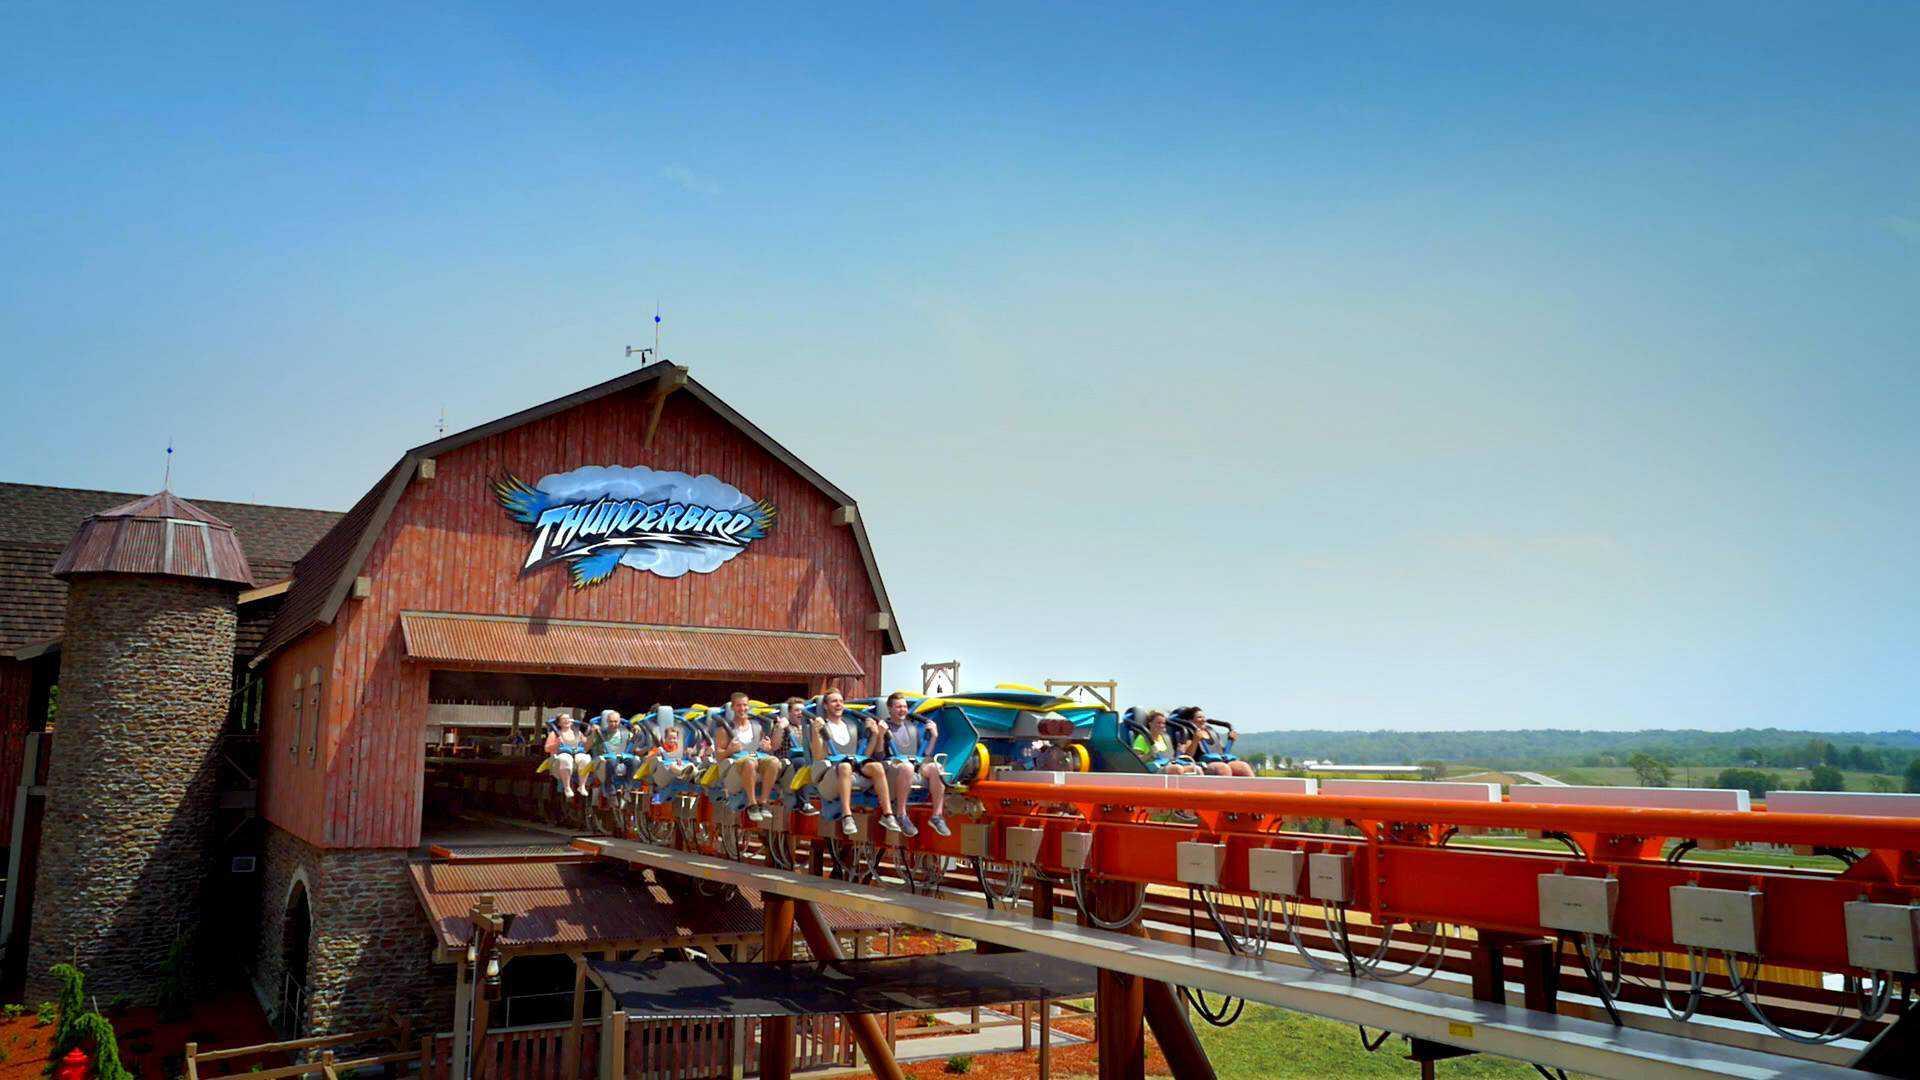 Thunderbird at Holiday World Theme Park & Splashin' Safari Water Park